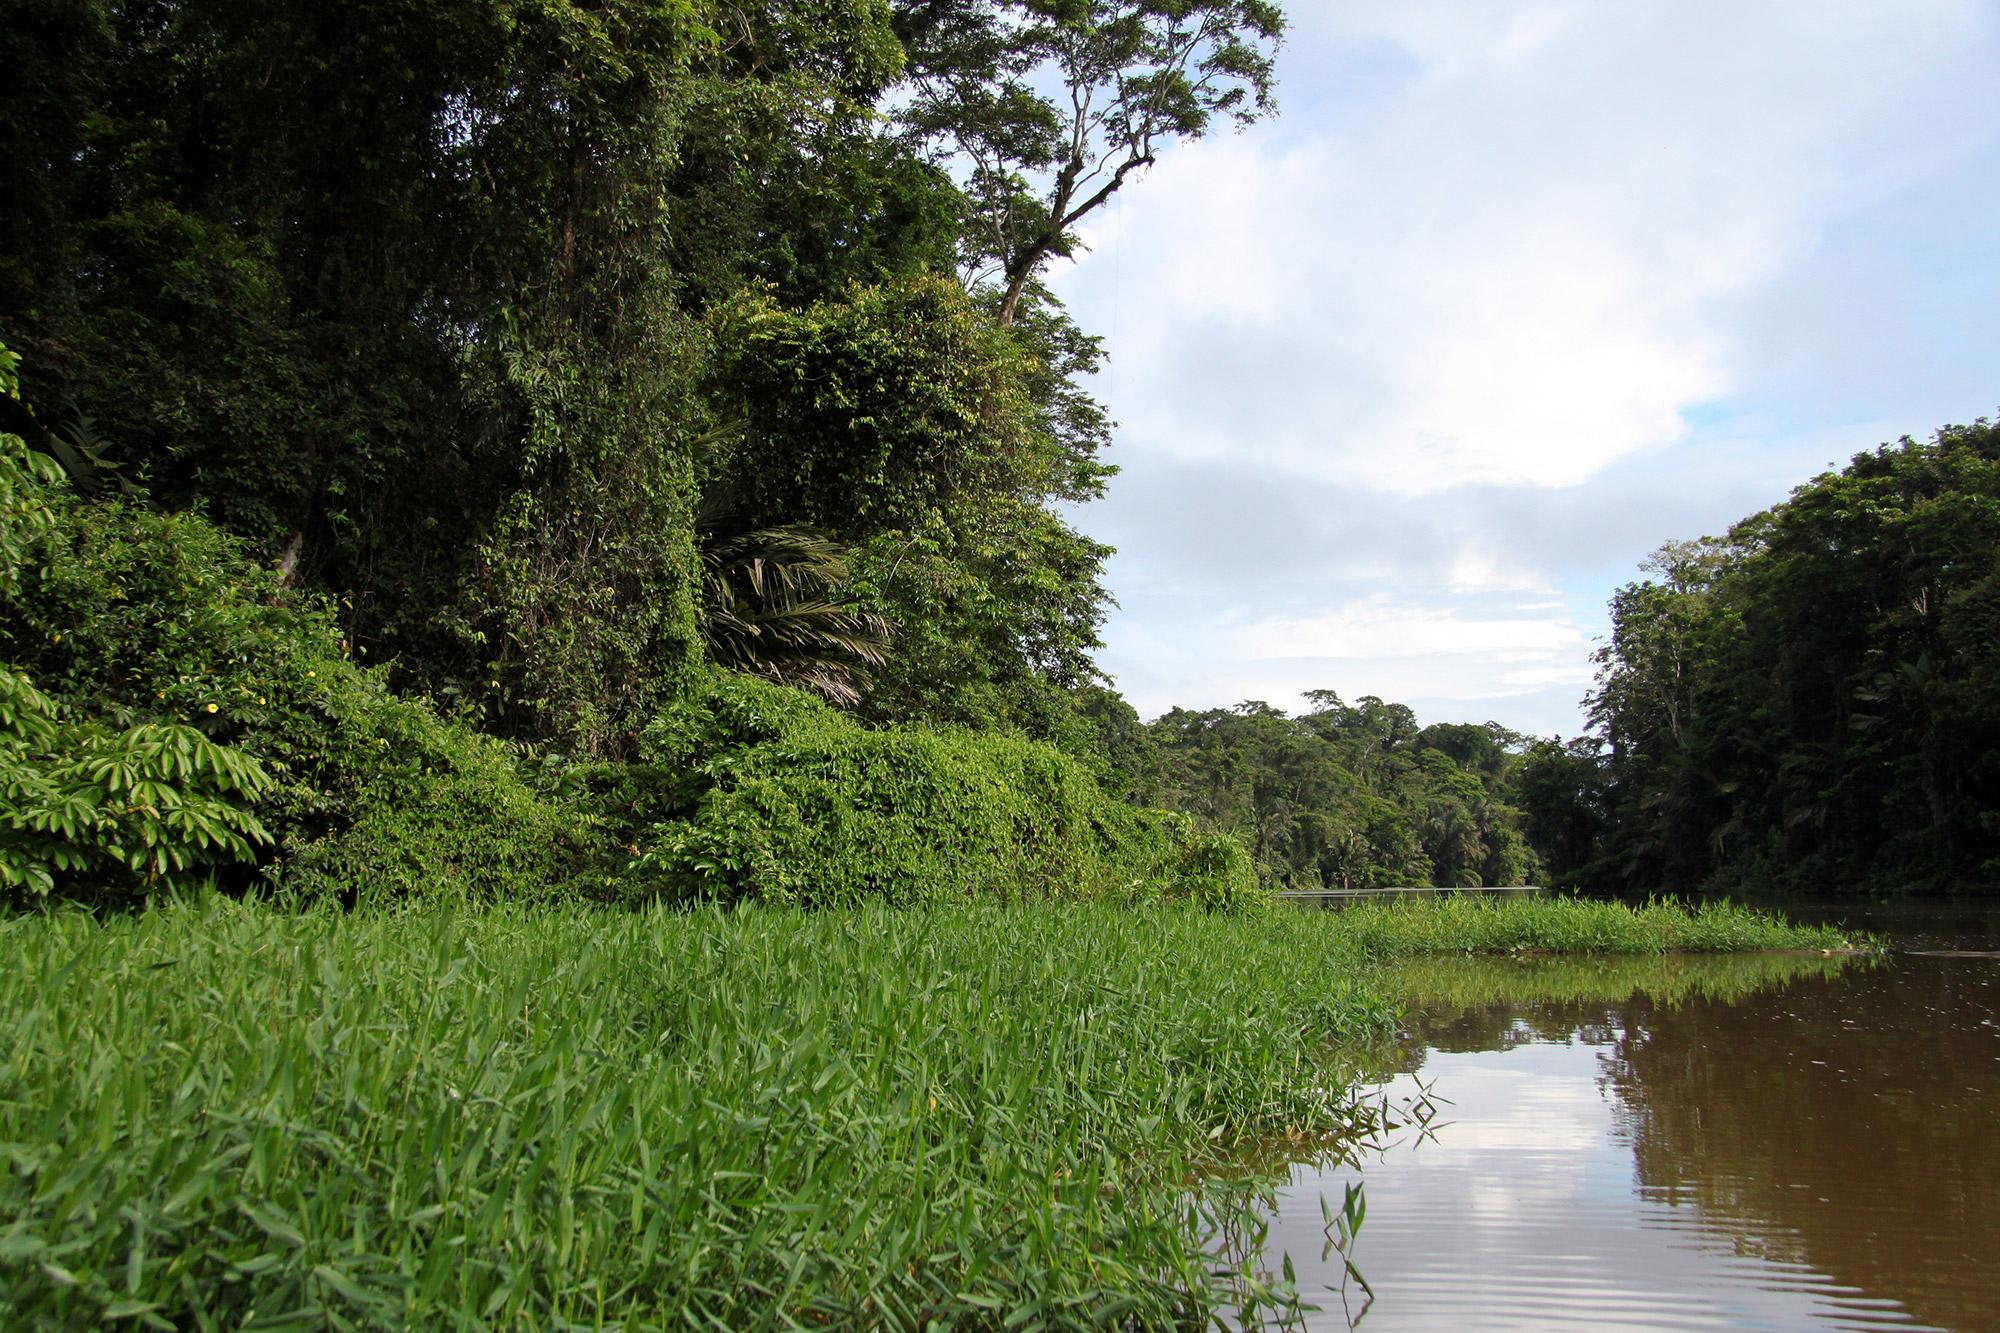 Onze favoriete nationale parken van Costa Rica - Parque Nacional Tortuguero